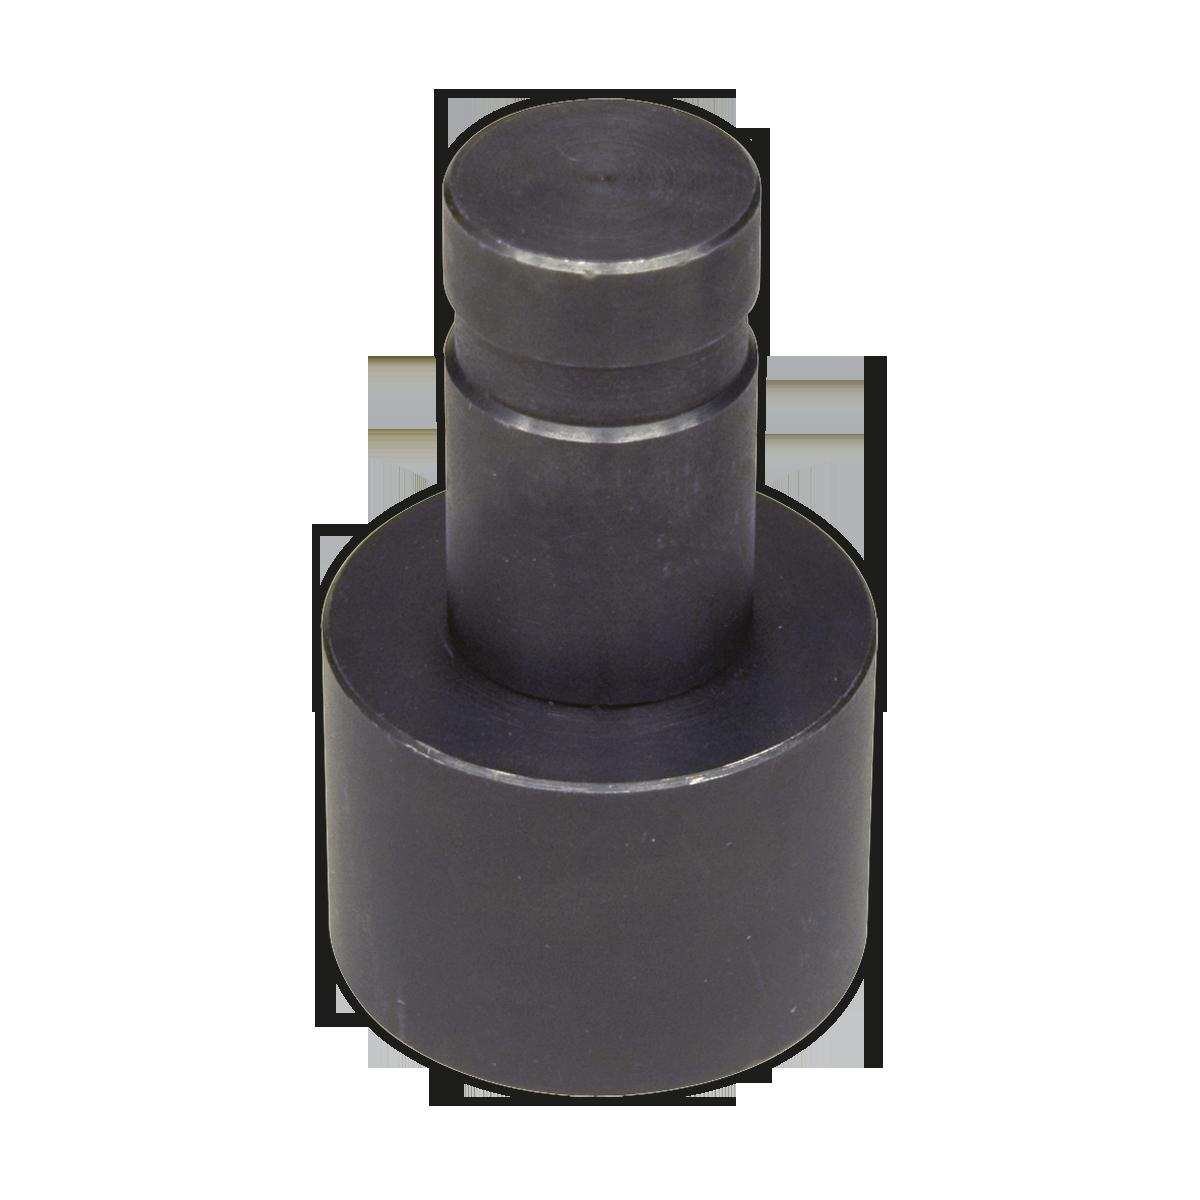 Adaptor for Oil Filter Crusher Ø60 x 115mm